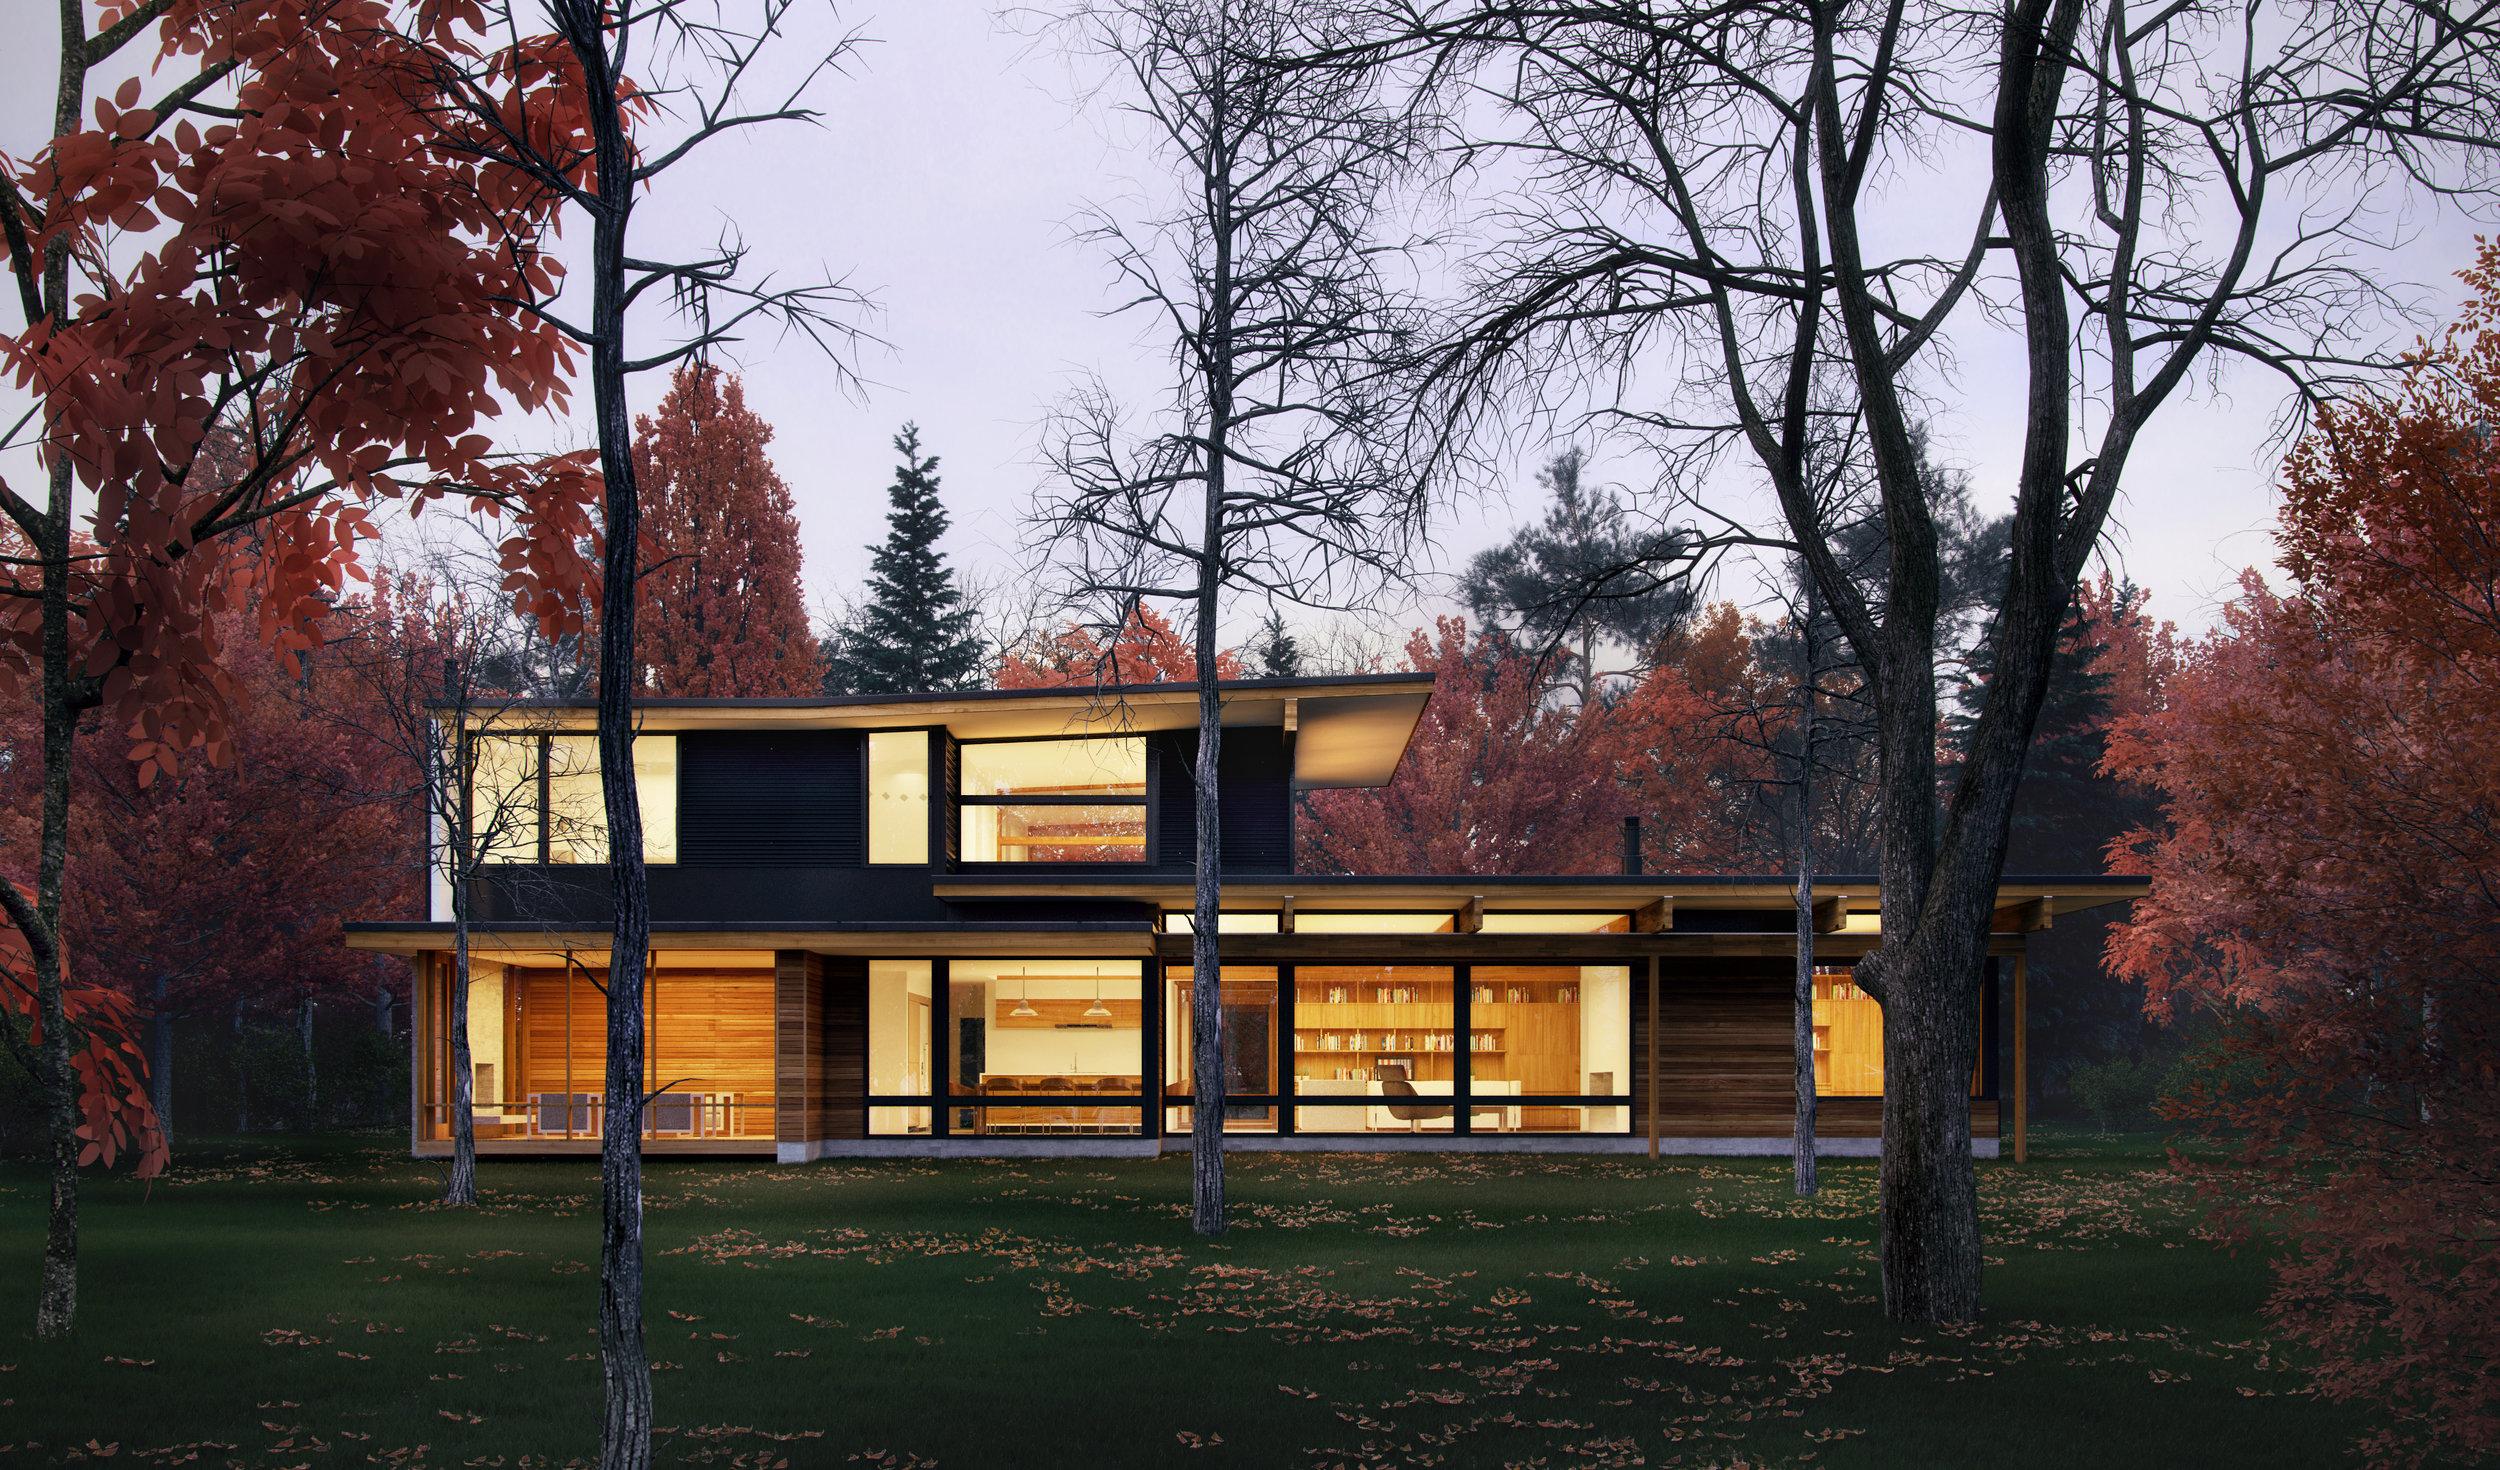 turkel_design_modern_prefab_home_axiom_series_axiom2450_exterior_rendering.jpg